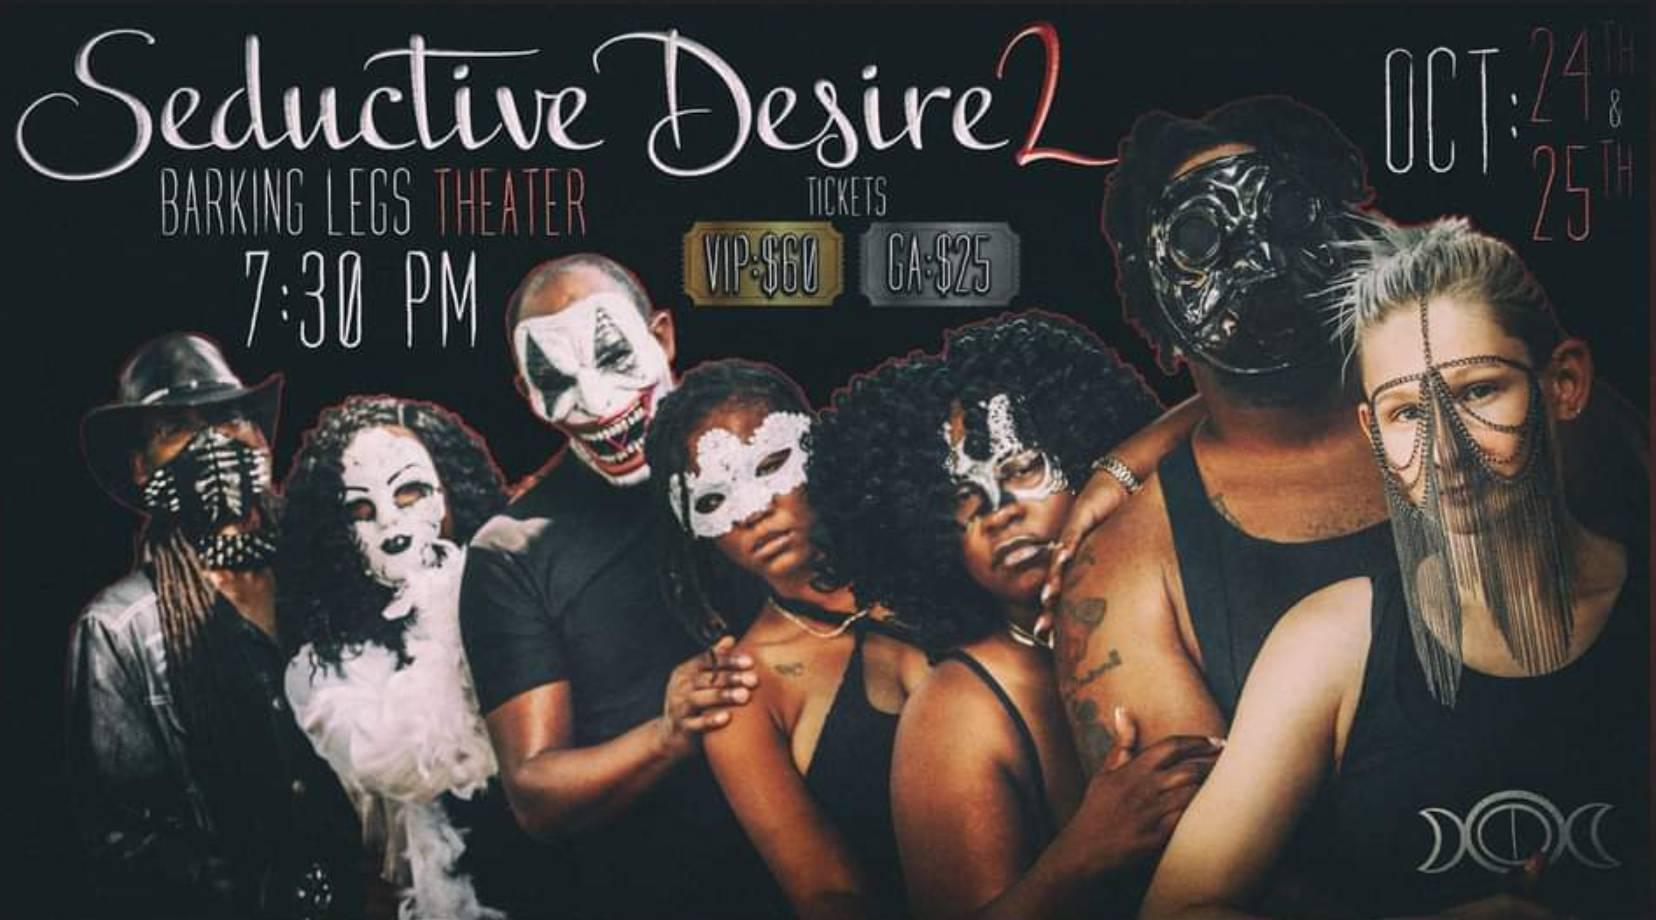 Seductive Desire (part 2)